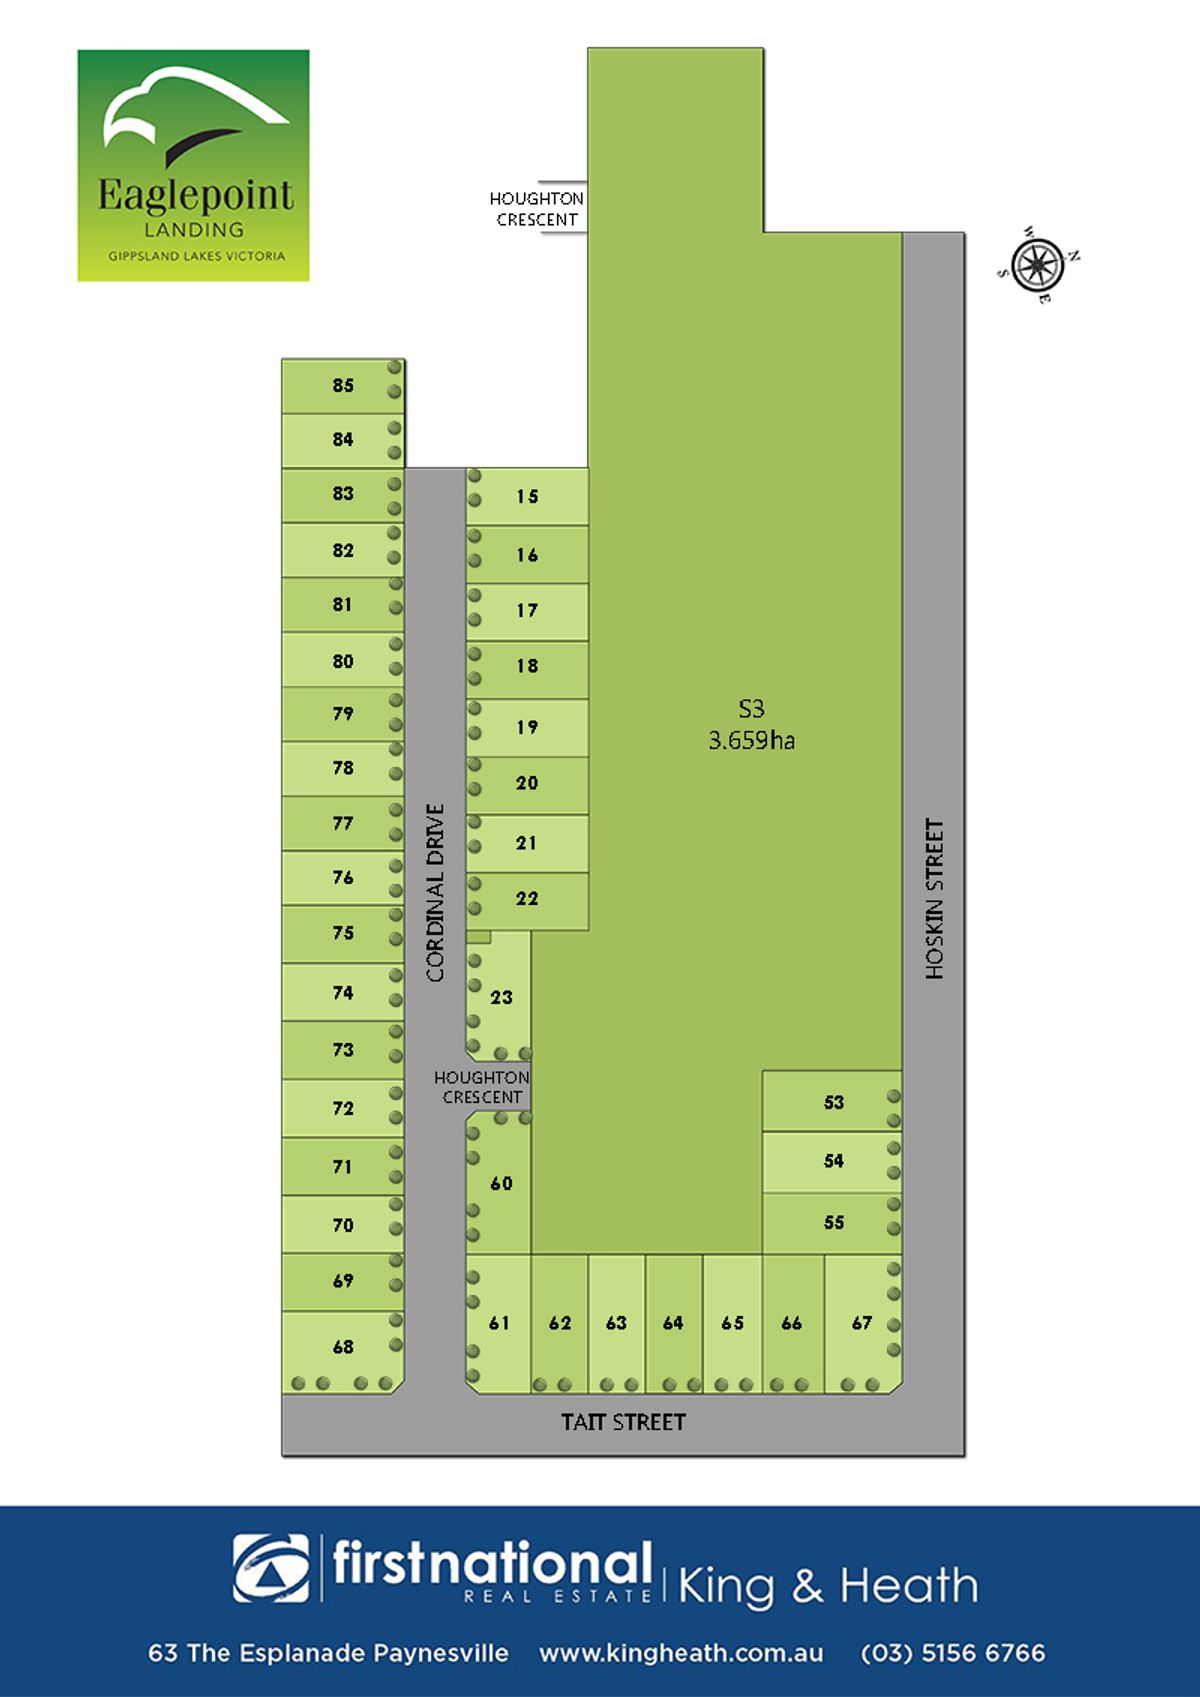 Lot 78, 32 Cardinal Drive, Eagle Point, VIC 3878